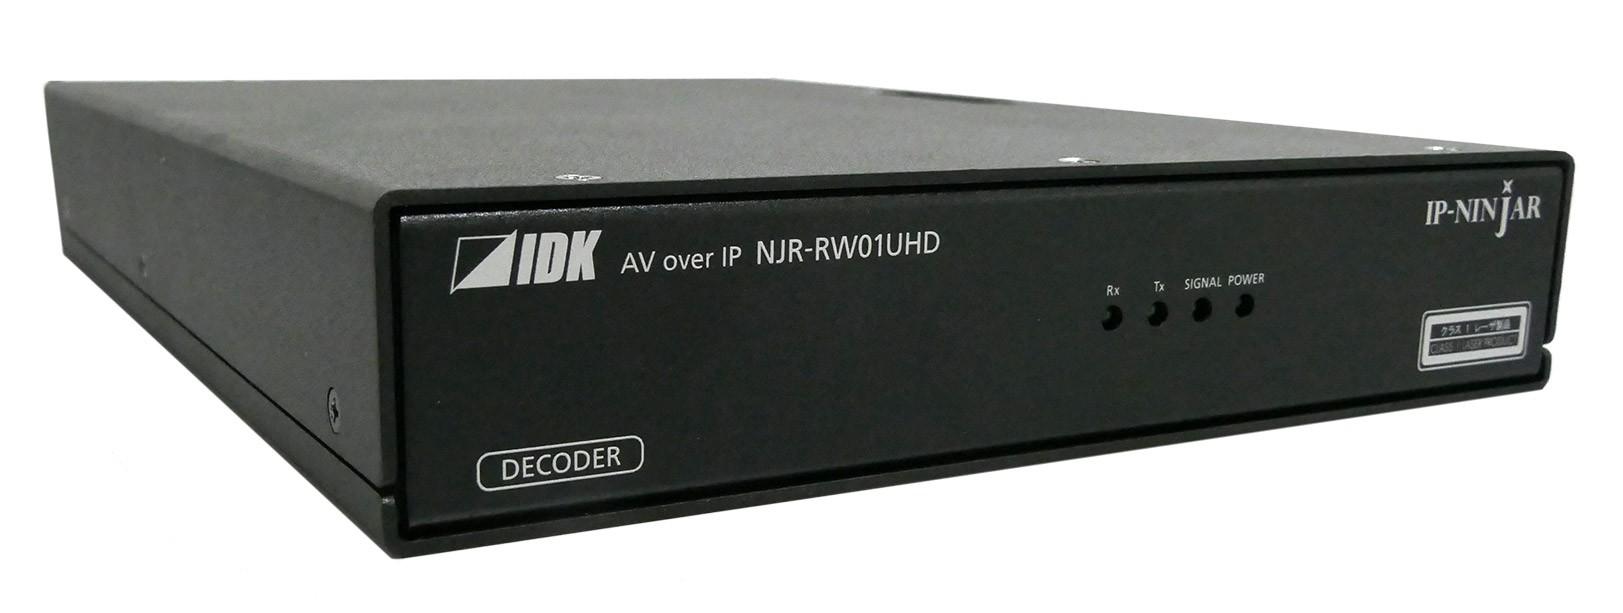 NJR-TW01UHD-MM-LAN